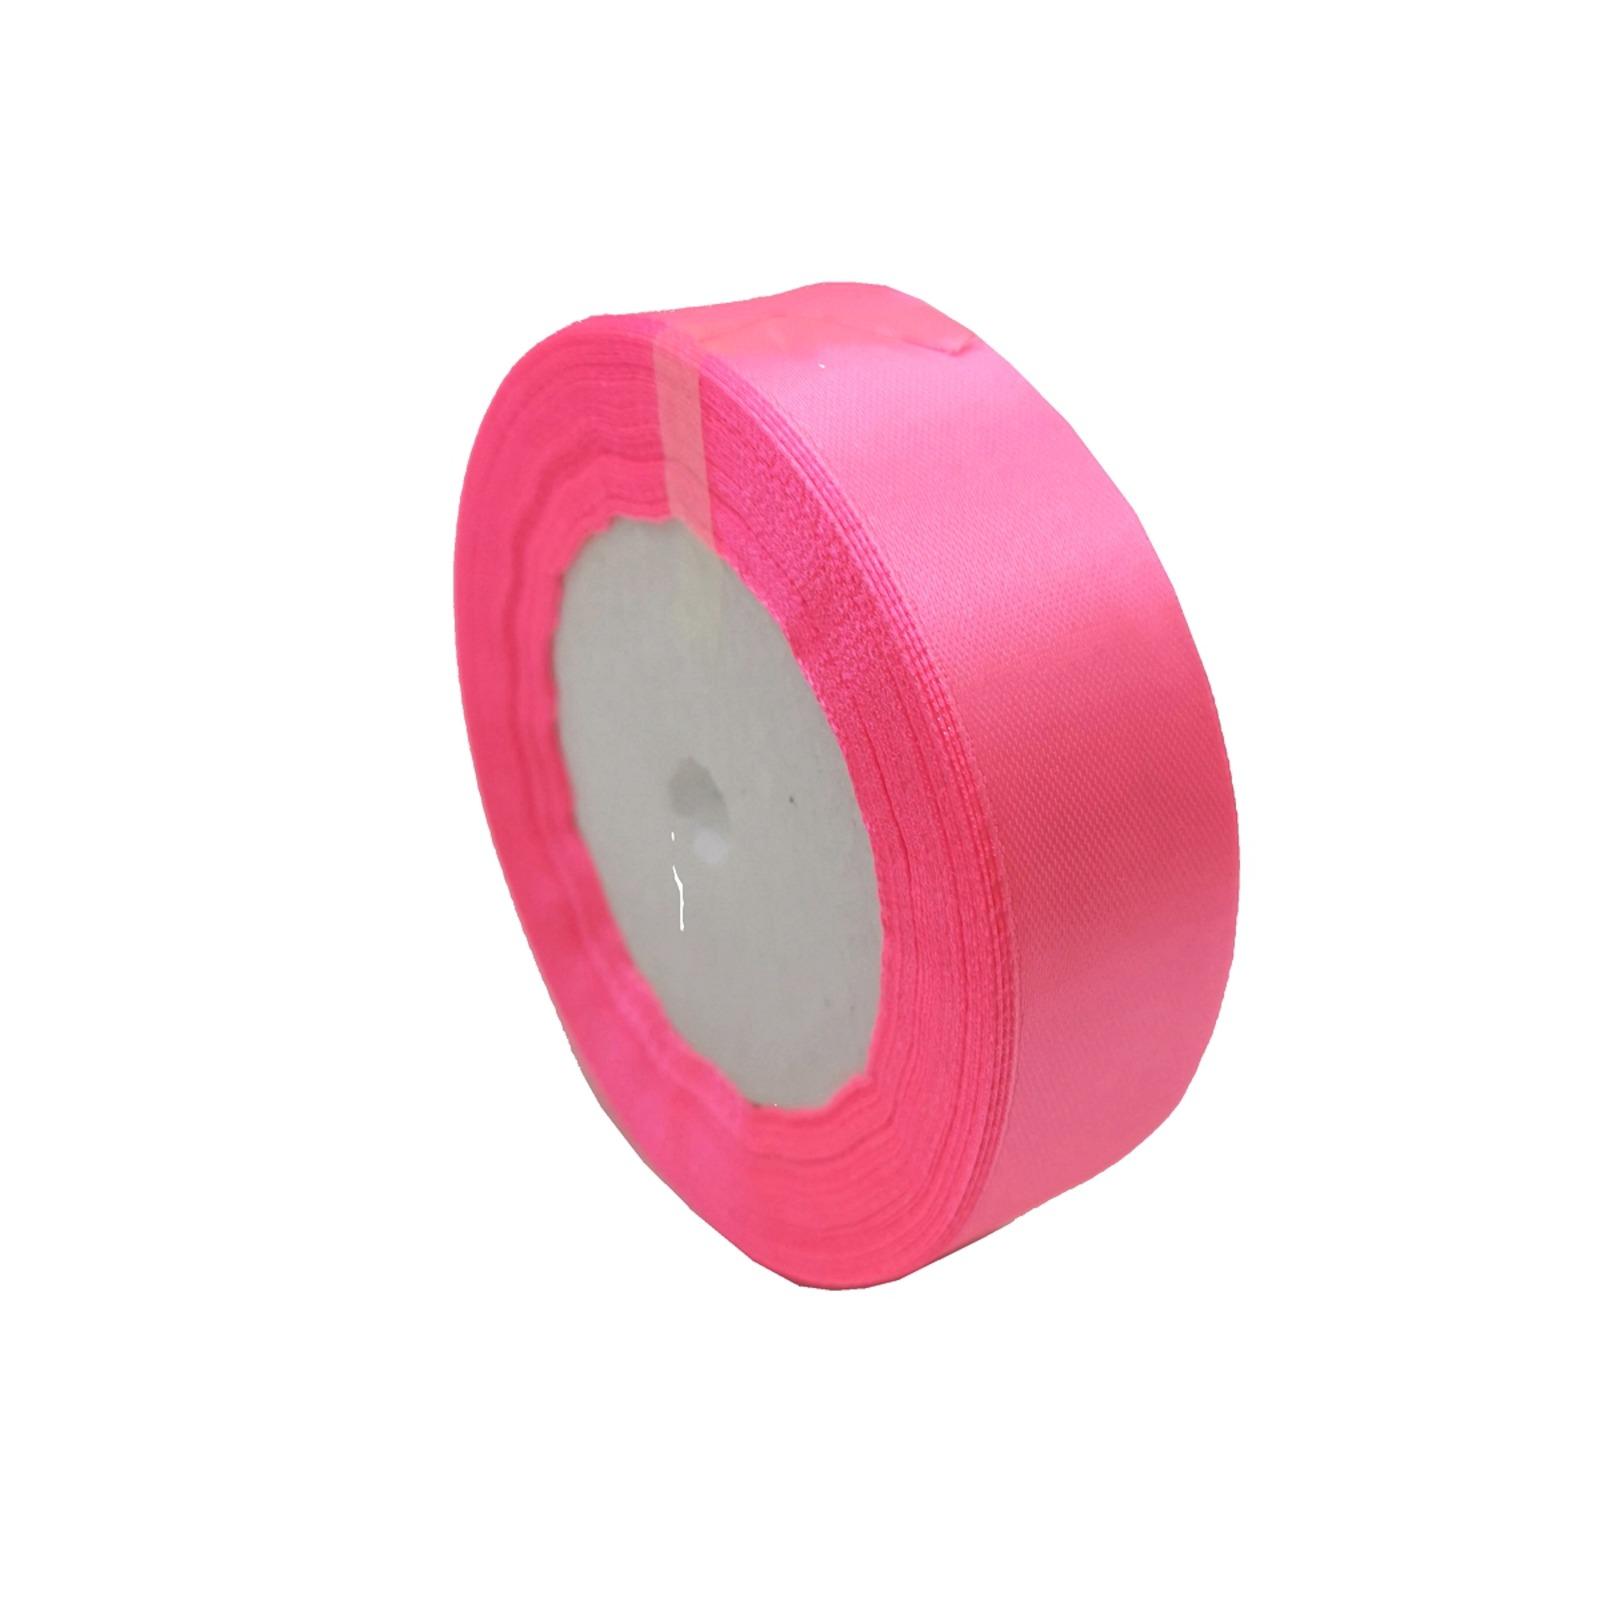 VIP Ribbon 2.5cm x 22.5m - Pink